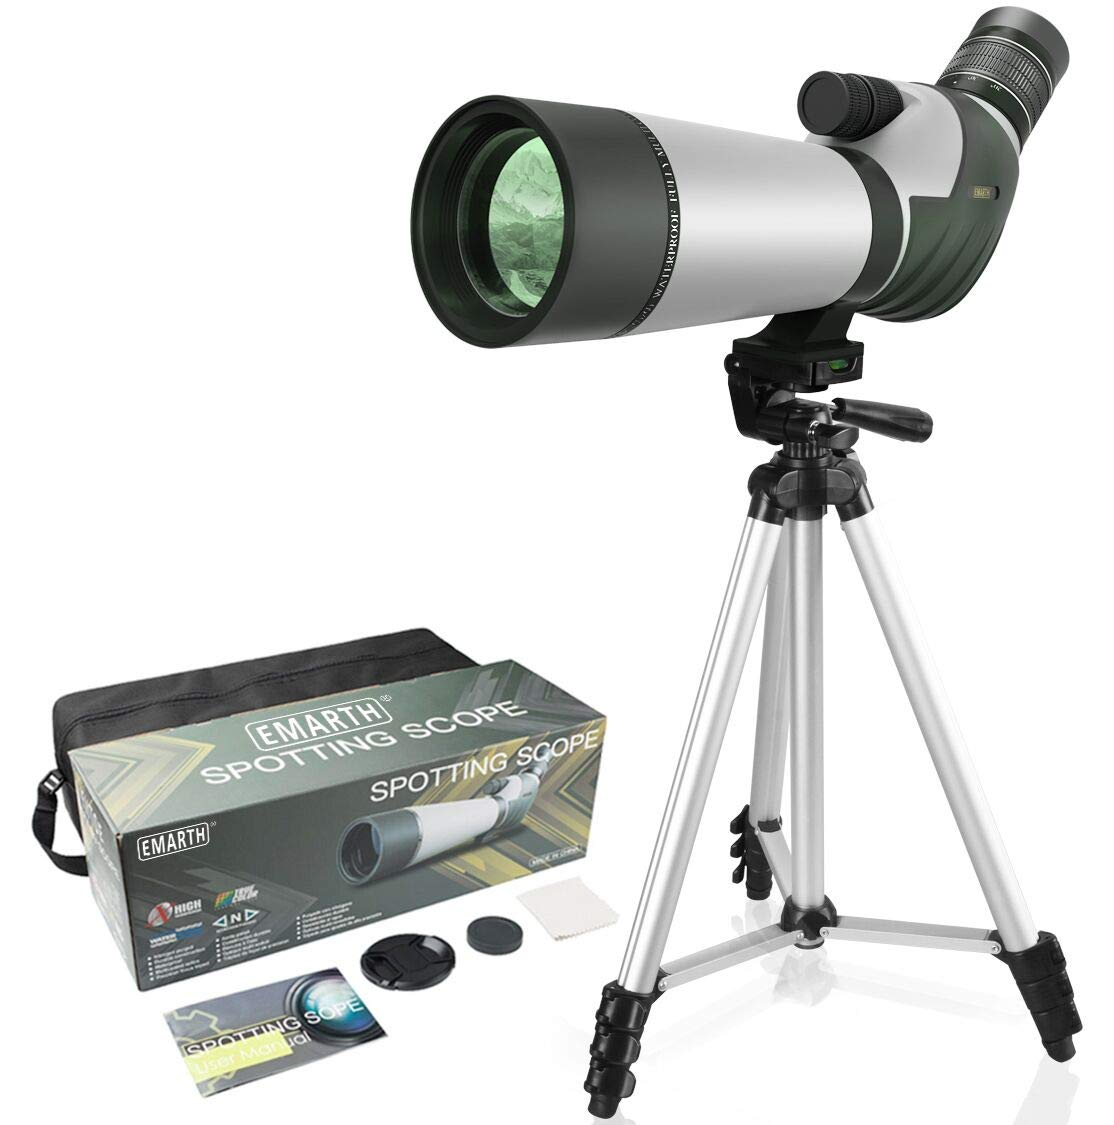 FEEMIC Upgrade 20-60x60 Waterproof Spotting Scope with Tripod, BAK4-45 Degree Angled Big Eyepiece(24mm), Optics Zoom 47-23.5M/1000M Spotting Scope for Target Shooting Bird Watching Hunting Wildlife by FEEMIC